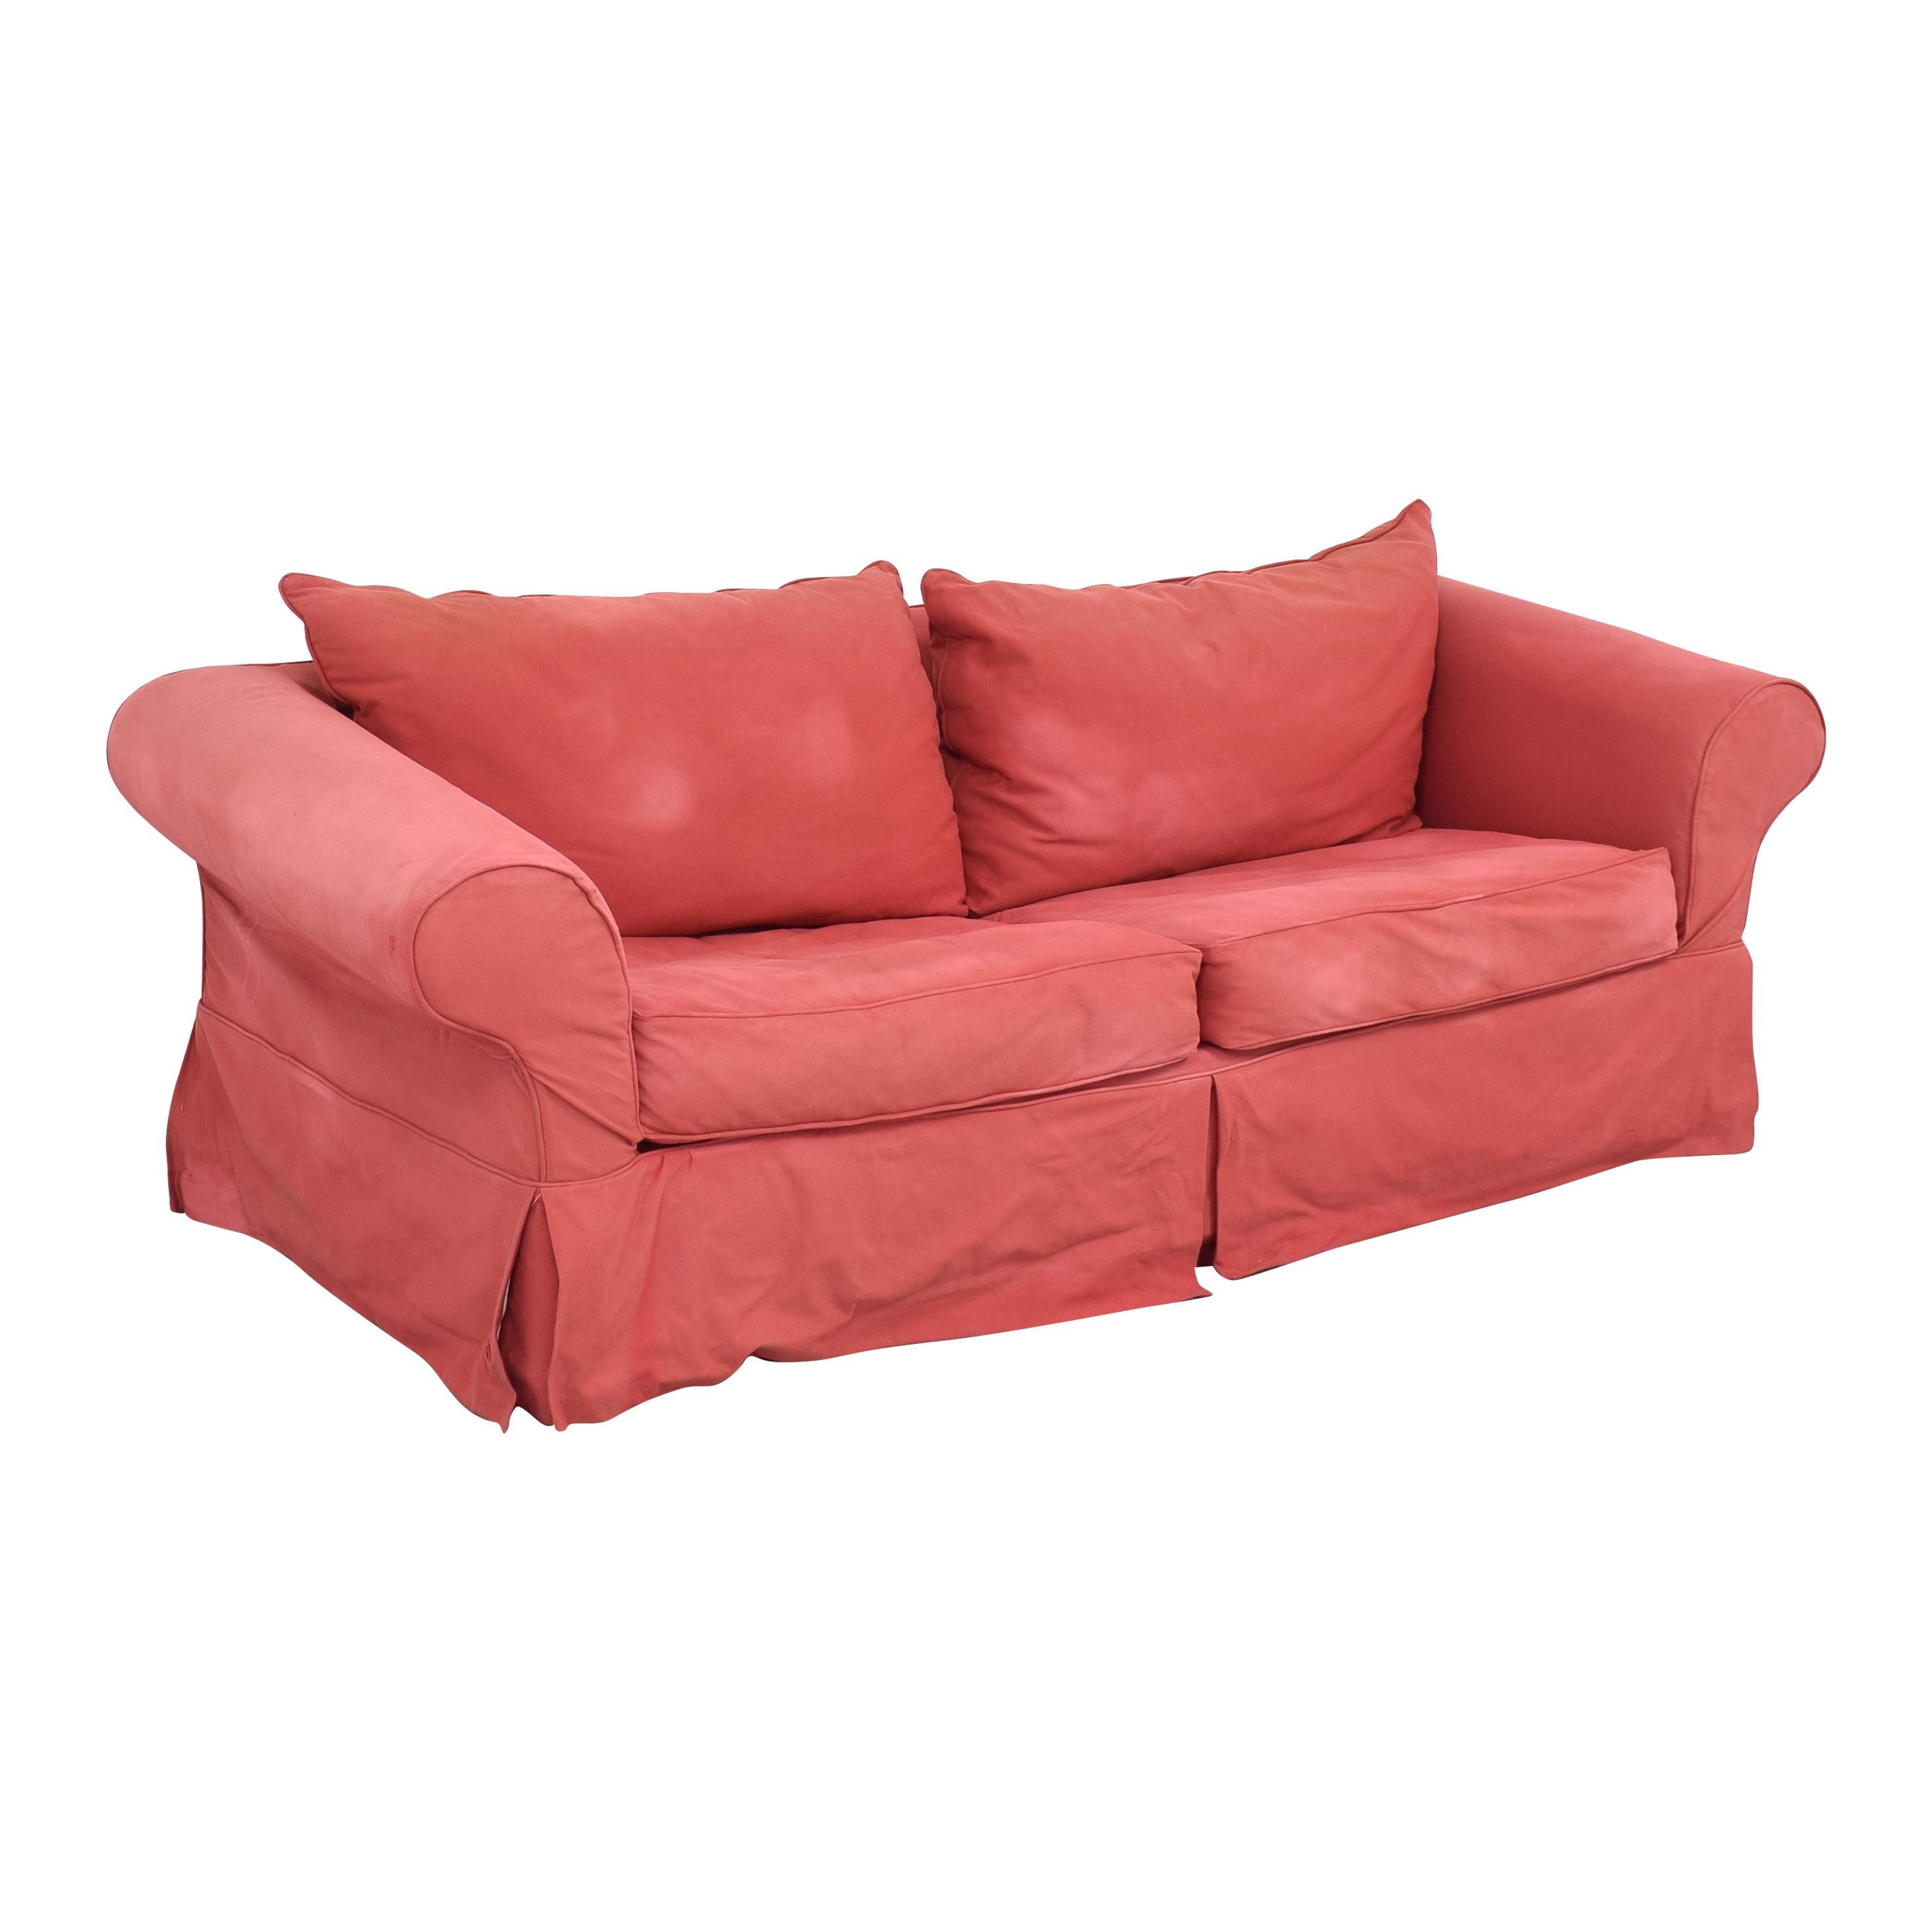 buy Storehouse Queen Sleeper Sofa Storehouse Sofa Beds